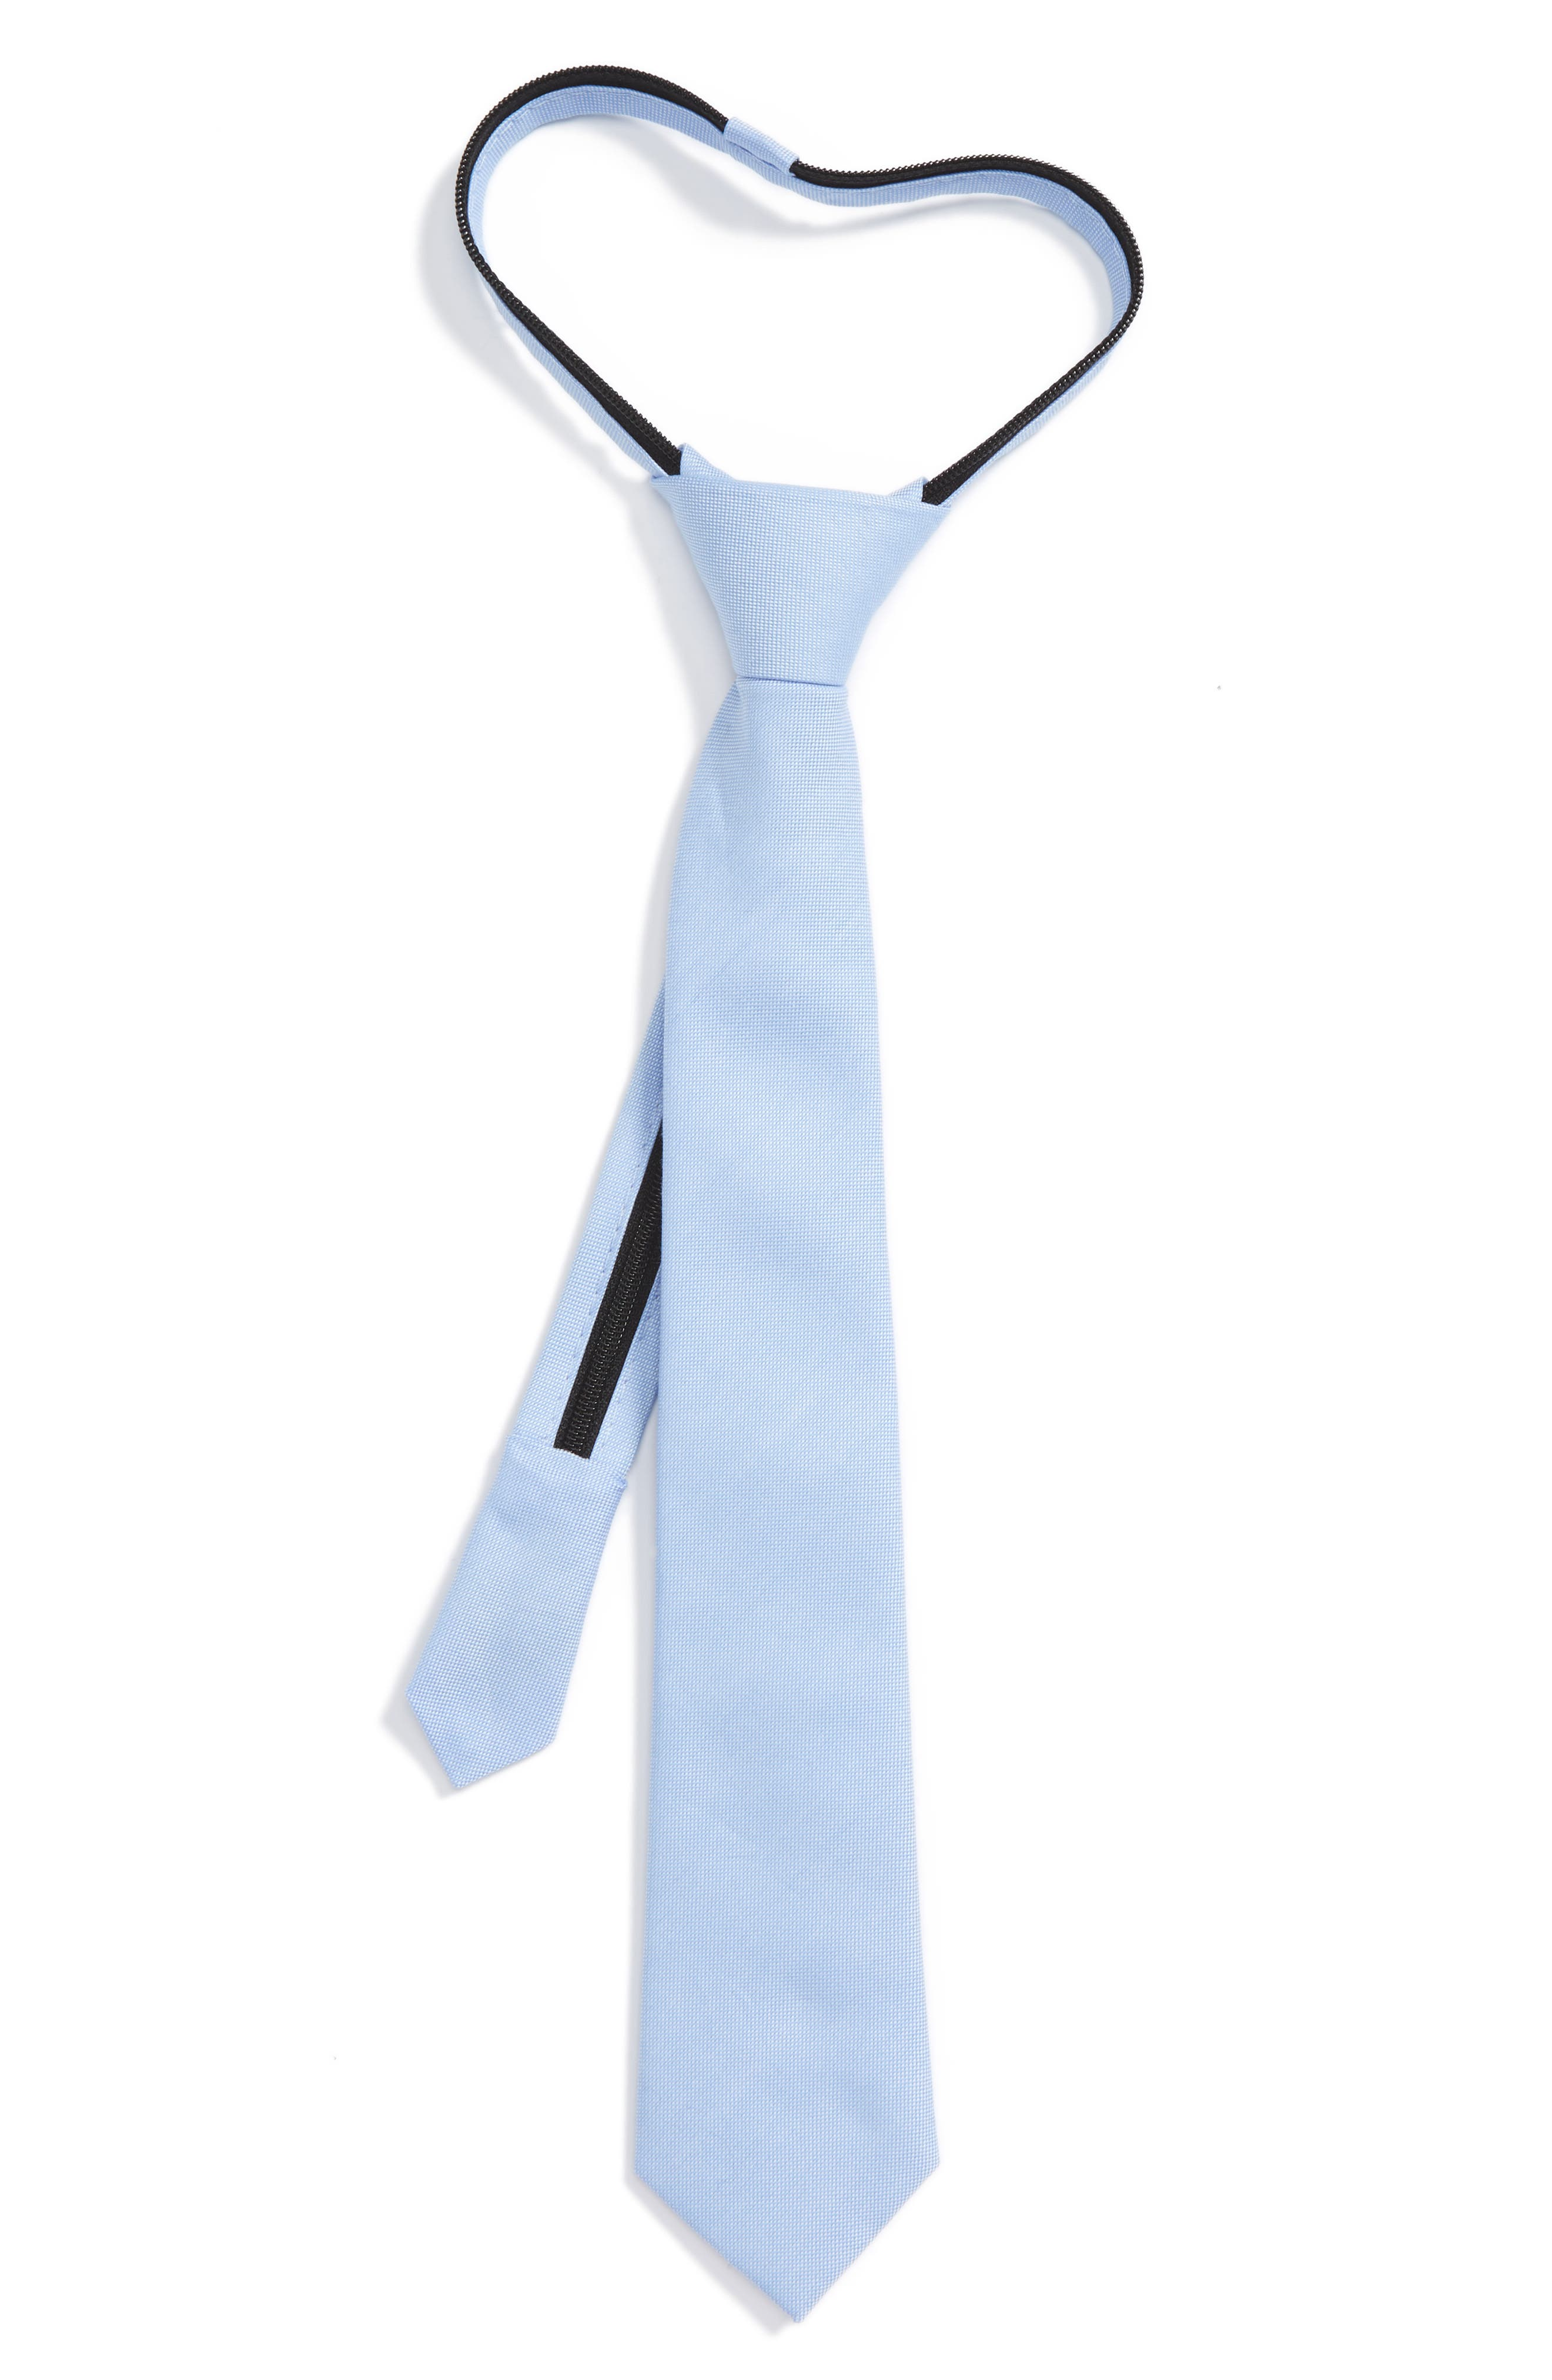 Solid Cotton Zipper Tie,                         Main,                         color, Light Blue Solid